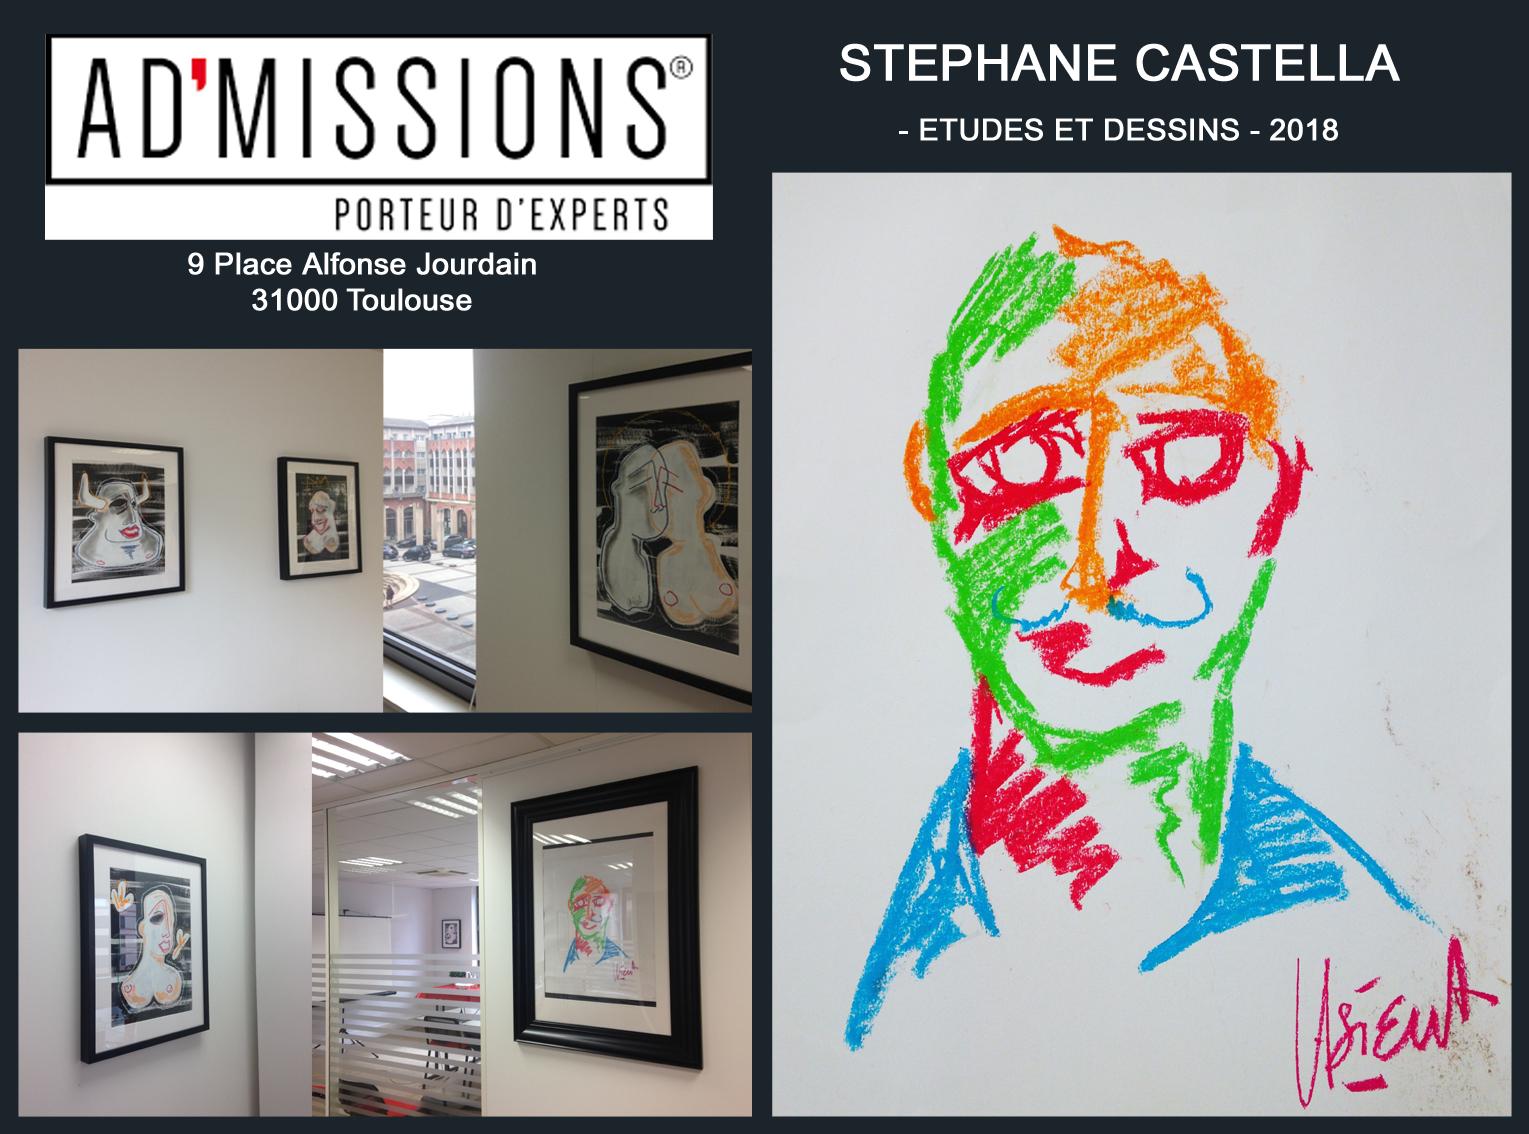 castella-EXPO AD MISSIONS 2018